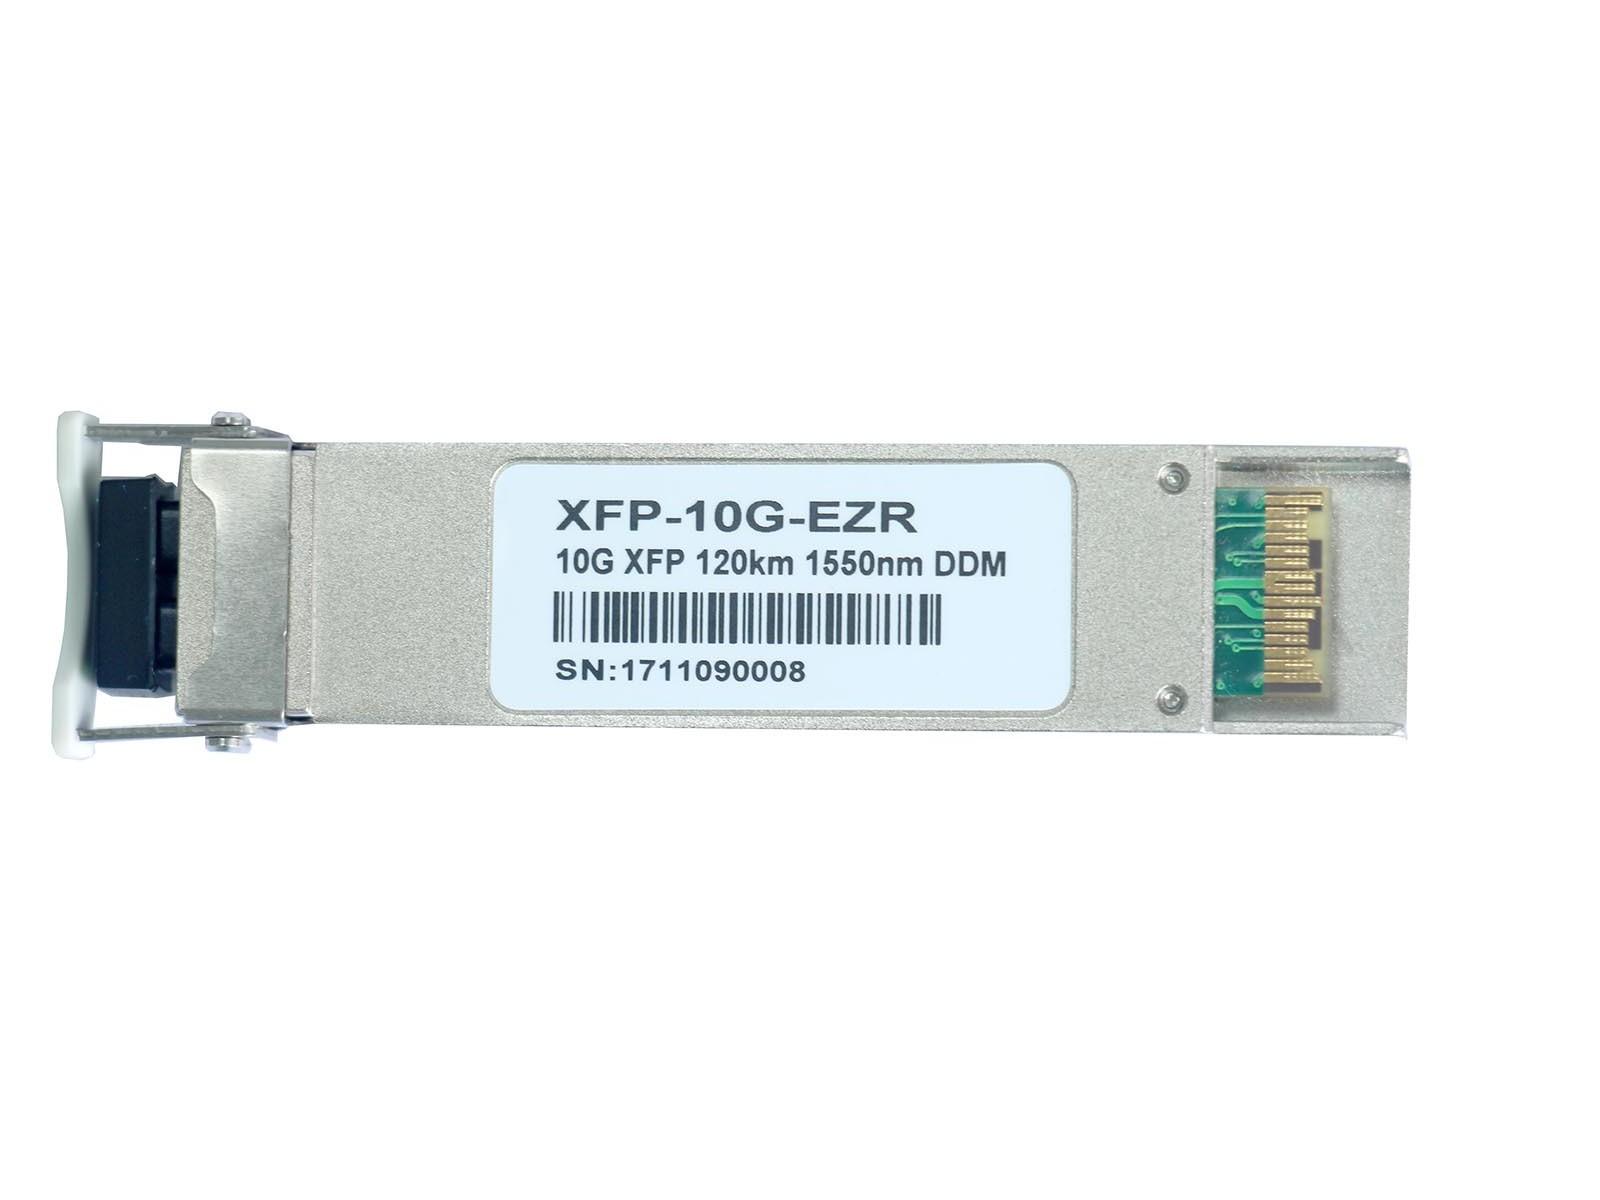 XFP-10G-EZR